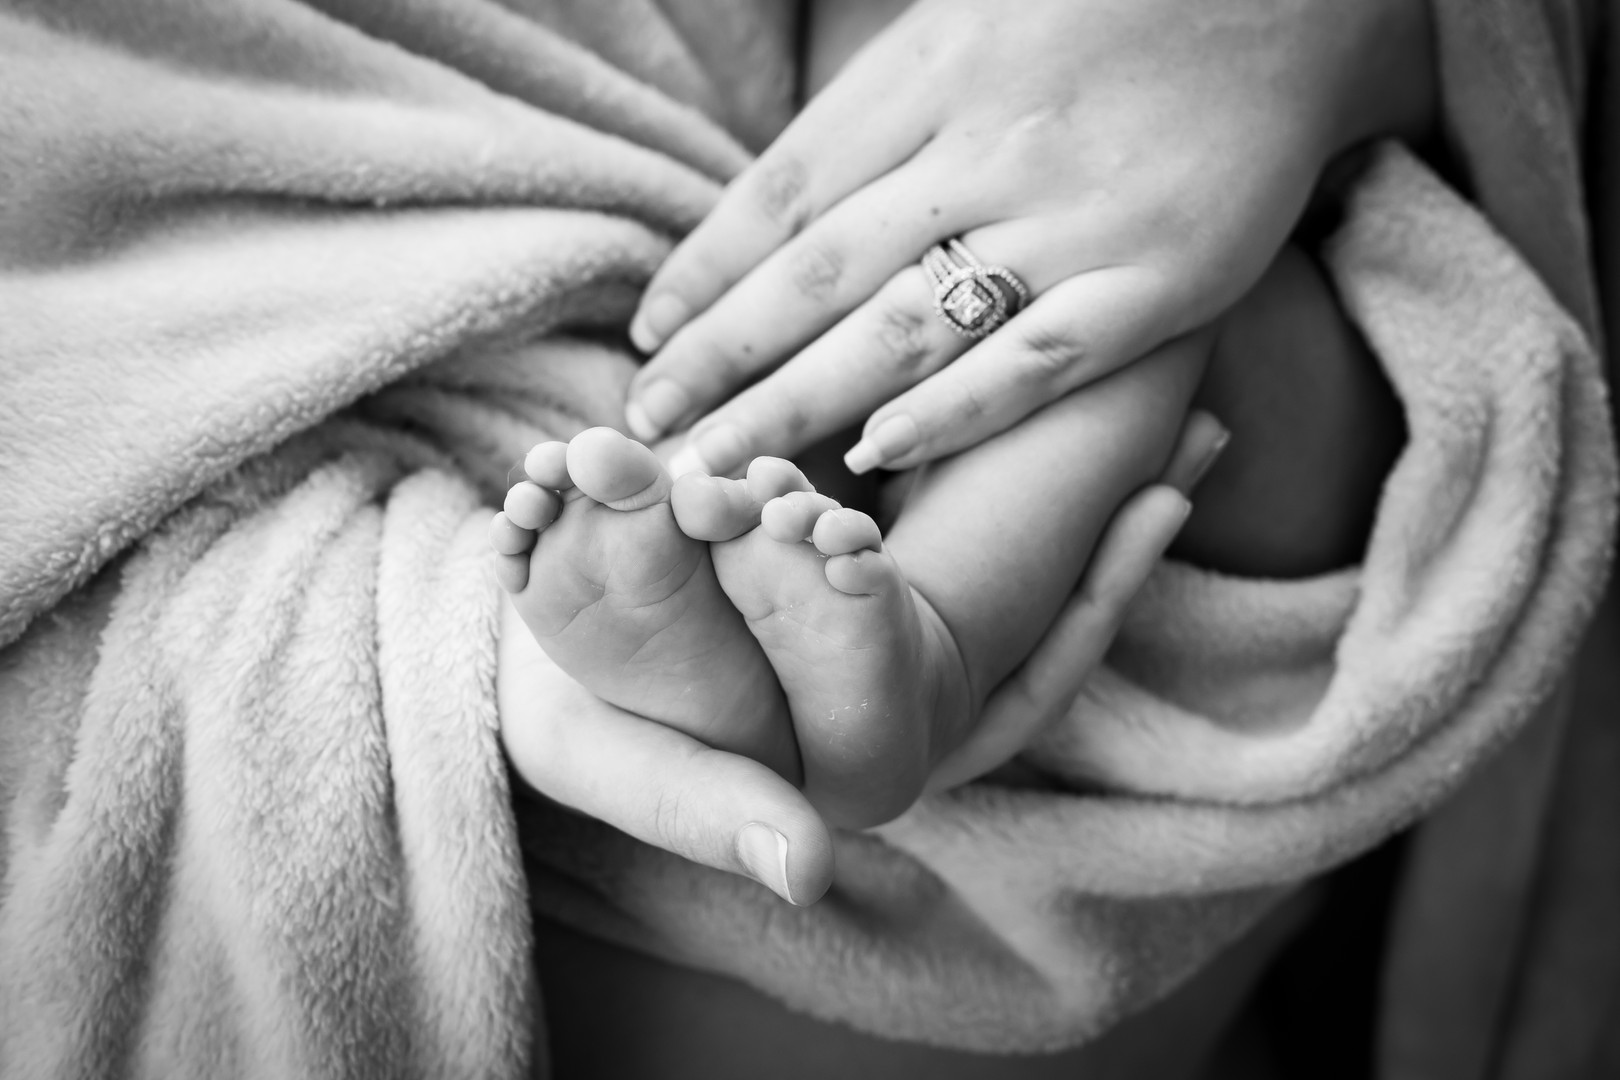 Baby Addison